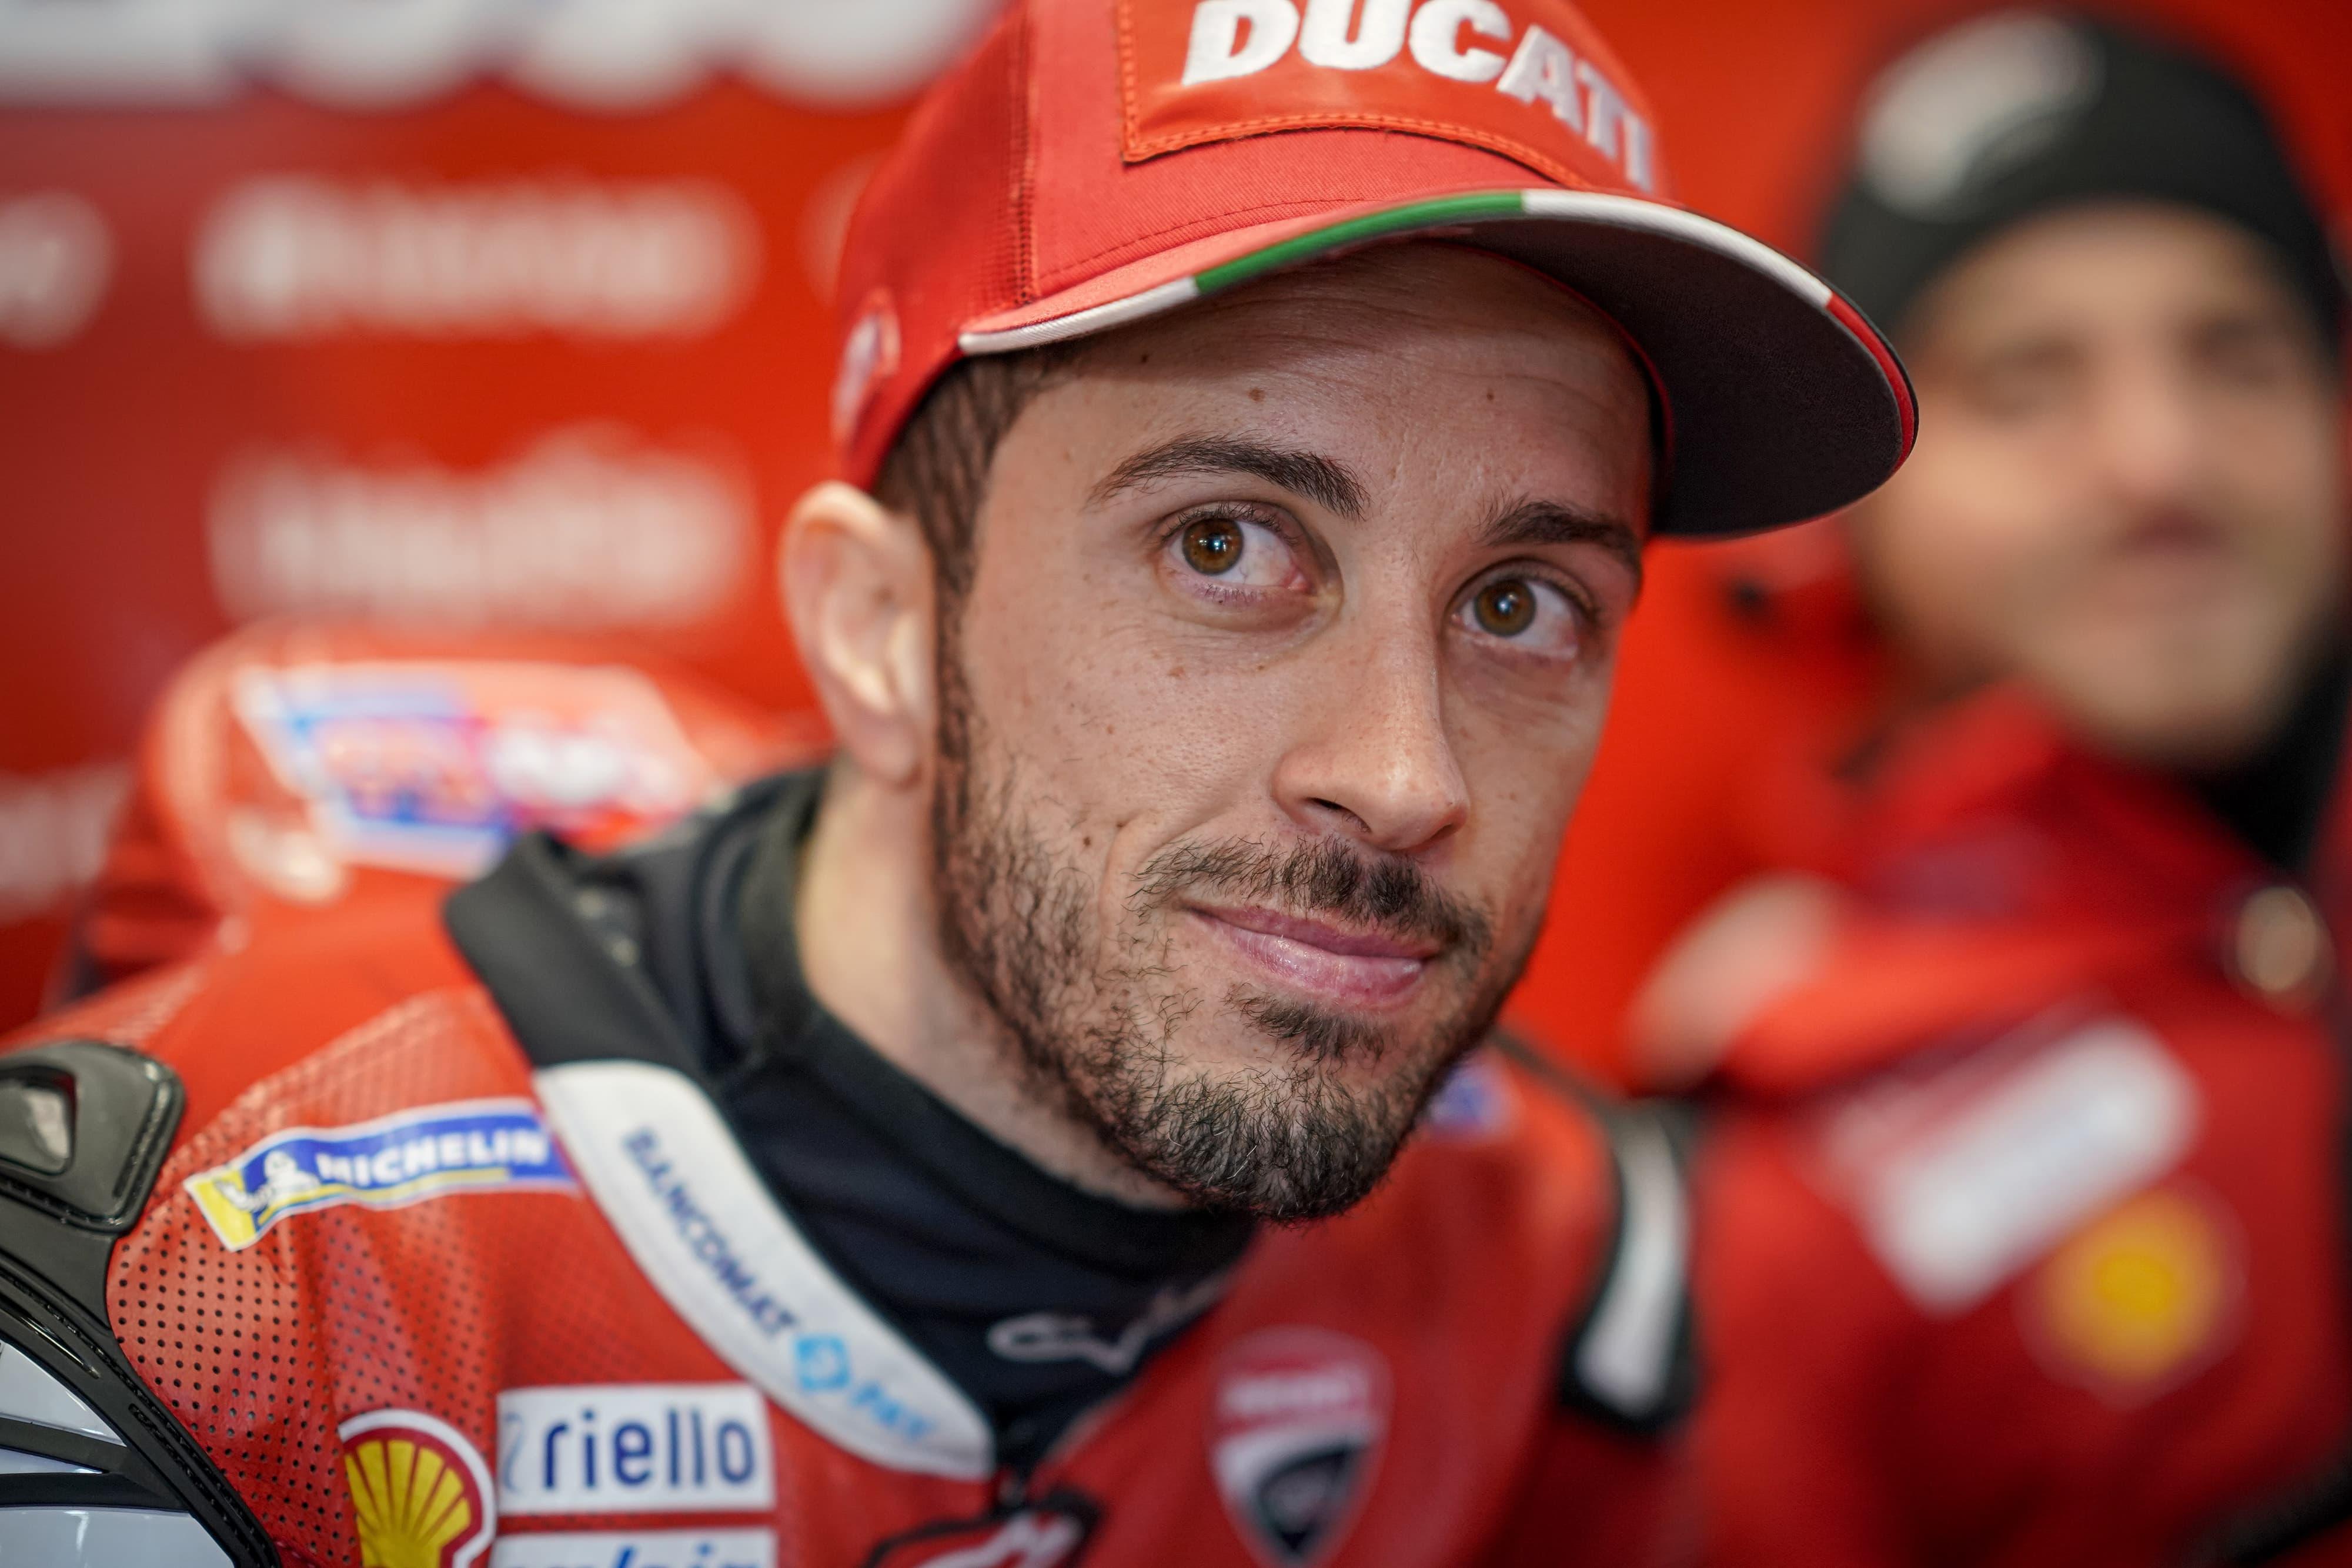 MotoGP2019オーストラリアGP ドヴィツィオーゾ「明日は問題なく走れることを願う」